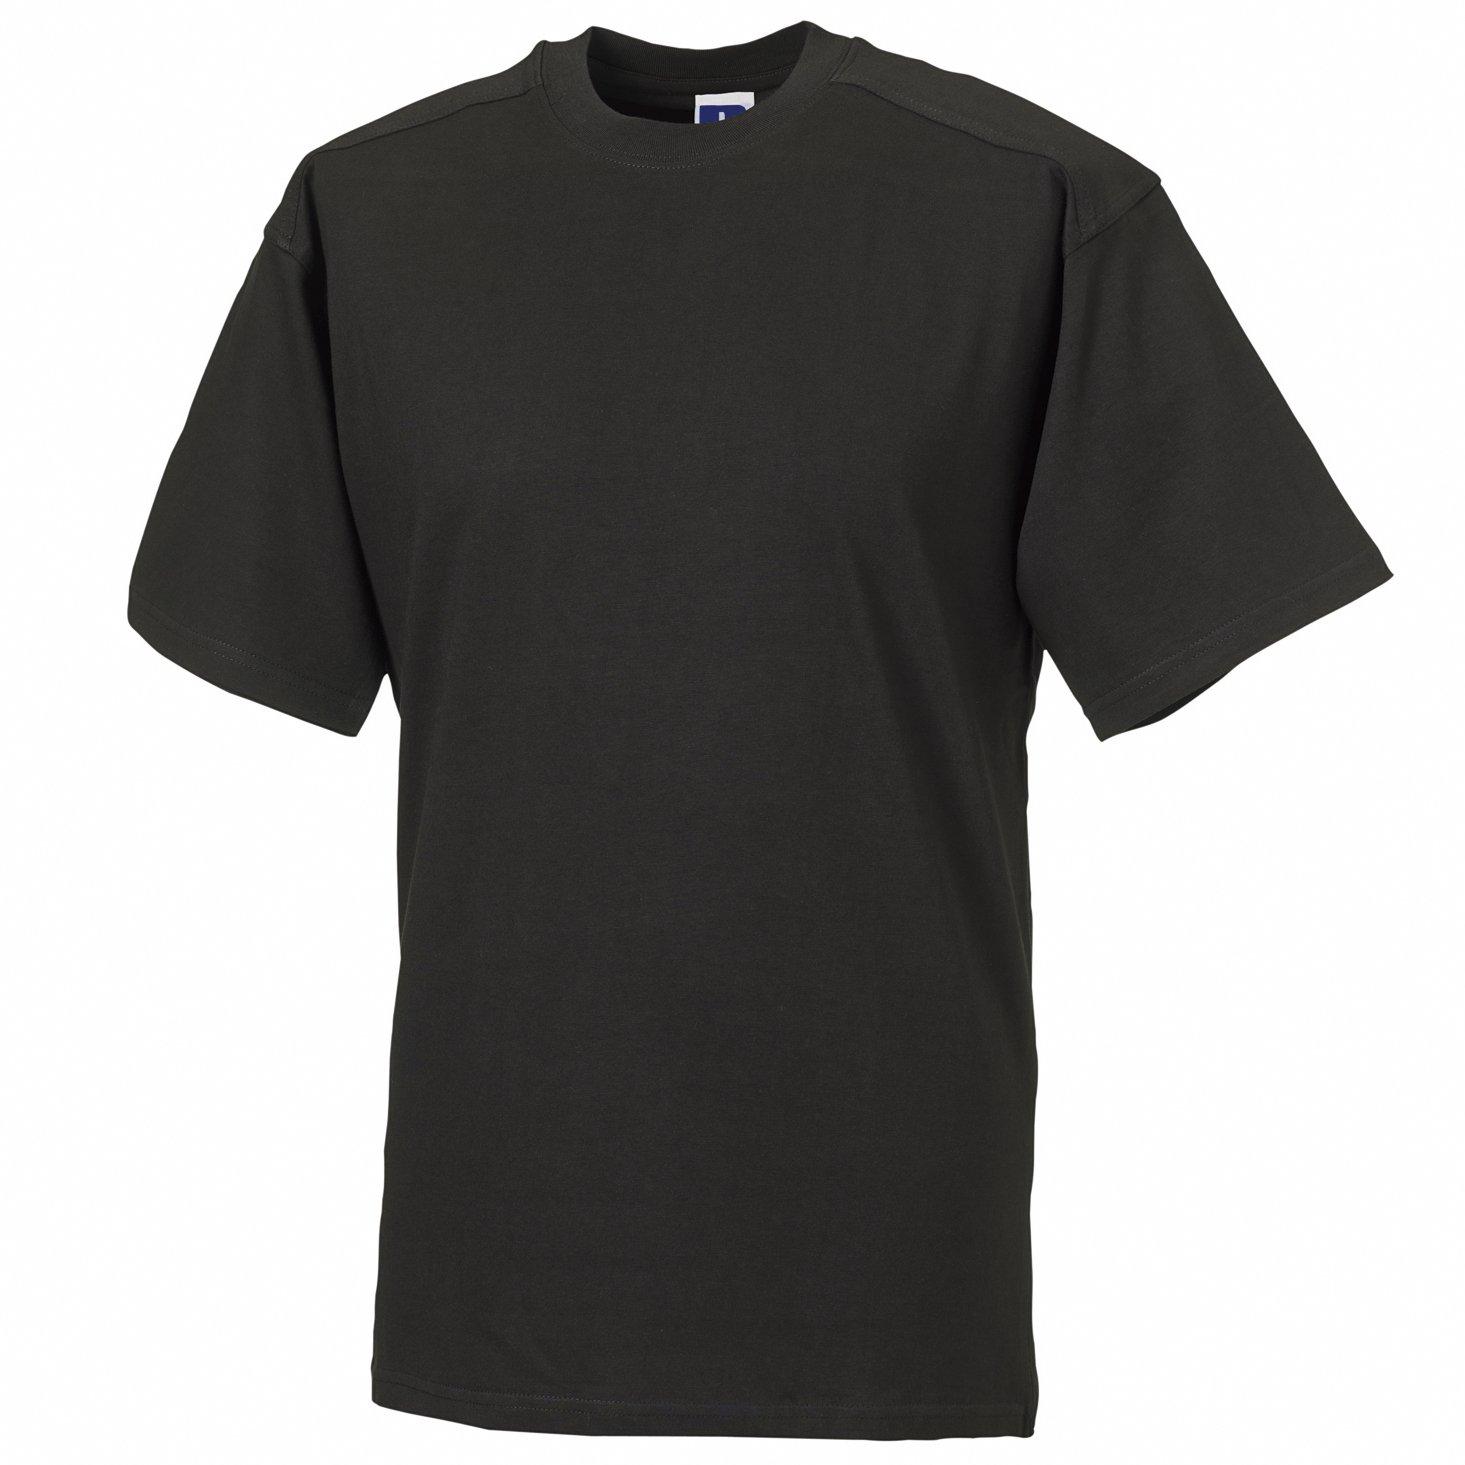 "Russell Europe Mens Workwear Short Sleeve Cotton T-Shirt (XL (42-44"" Chest)) (Black)"